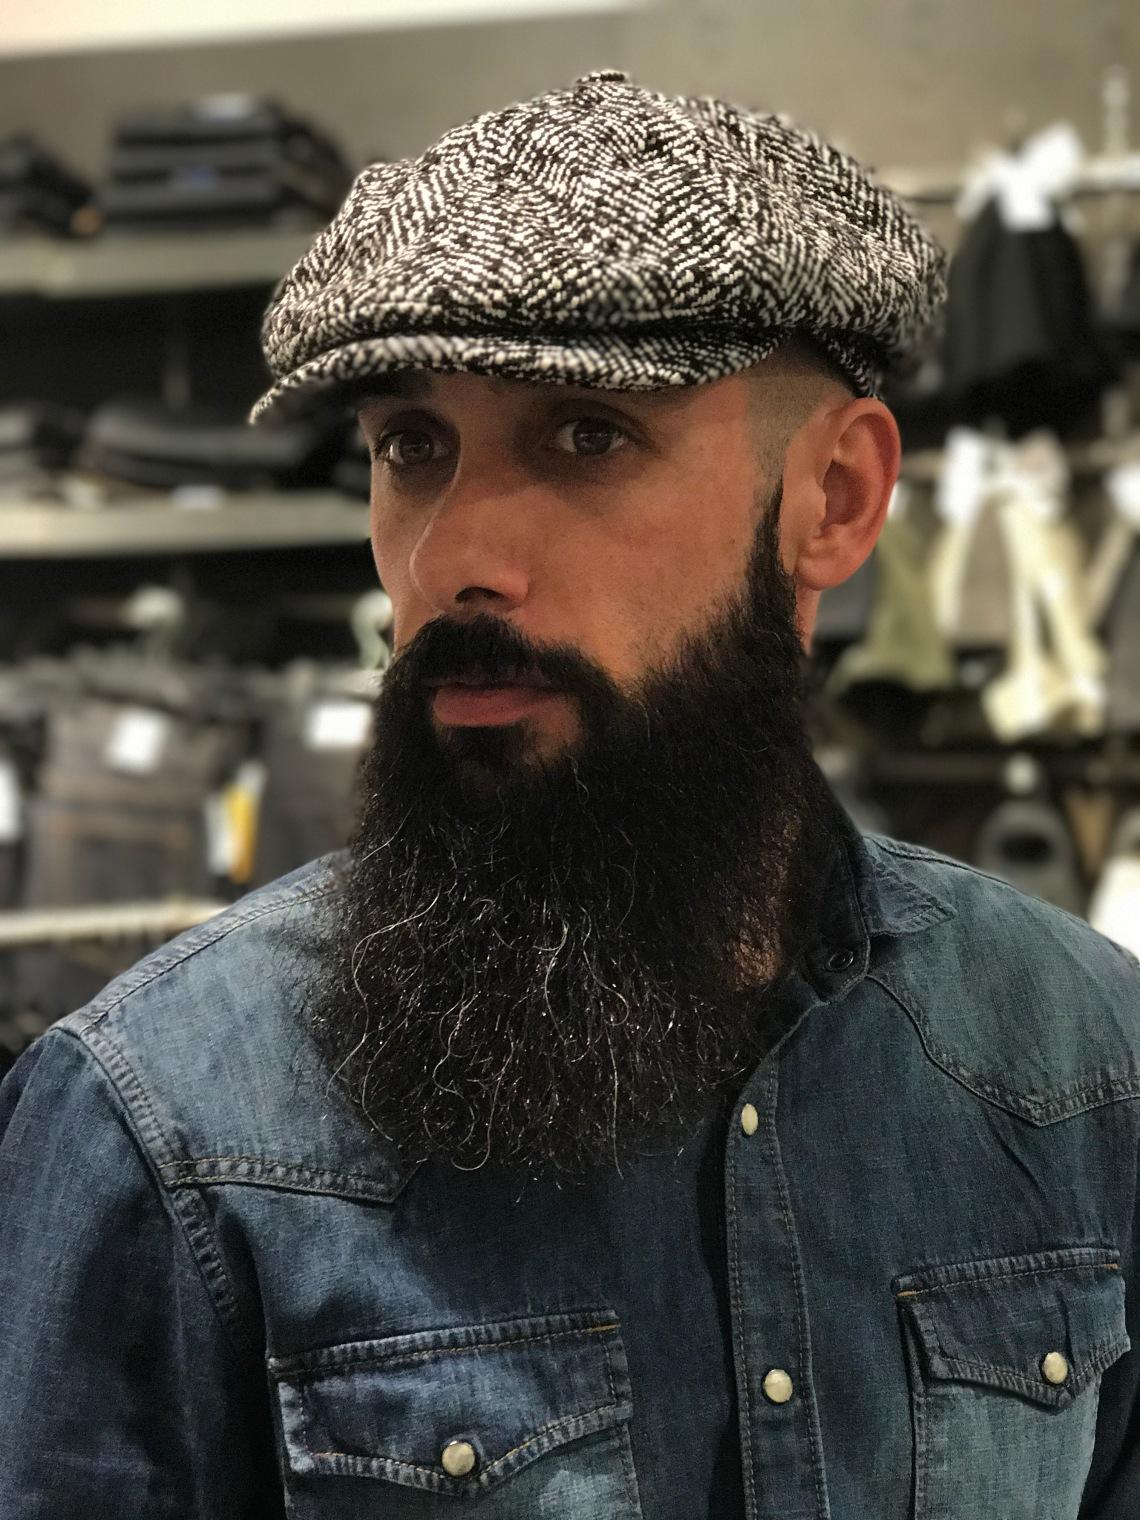 sombreros-chico-tipo-boina